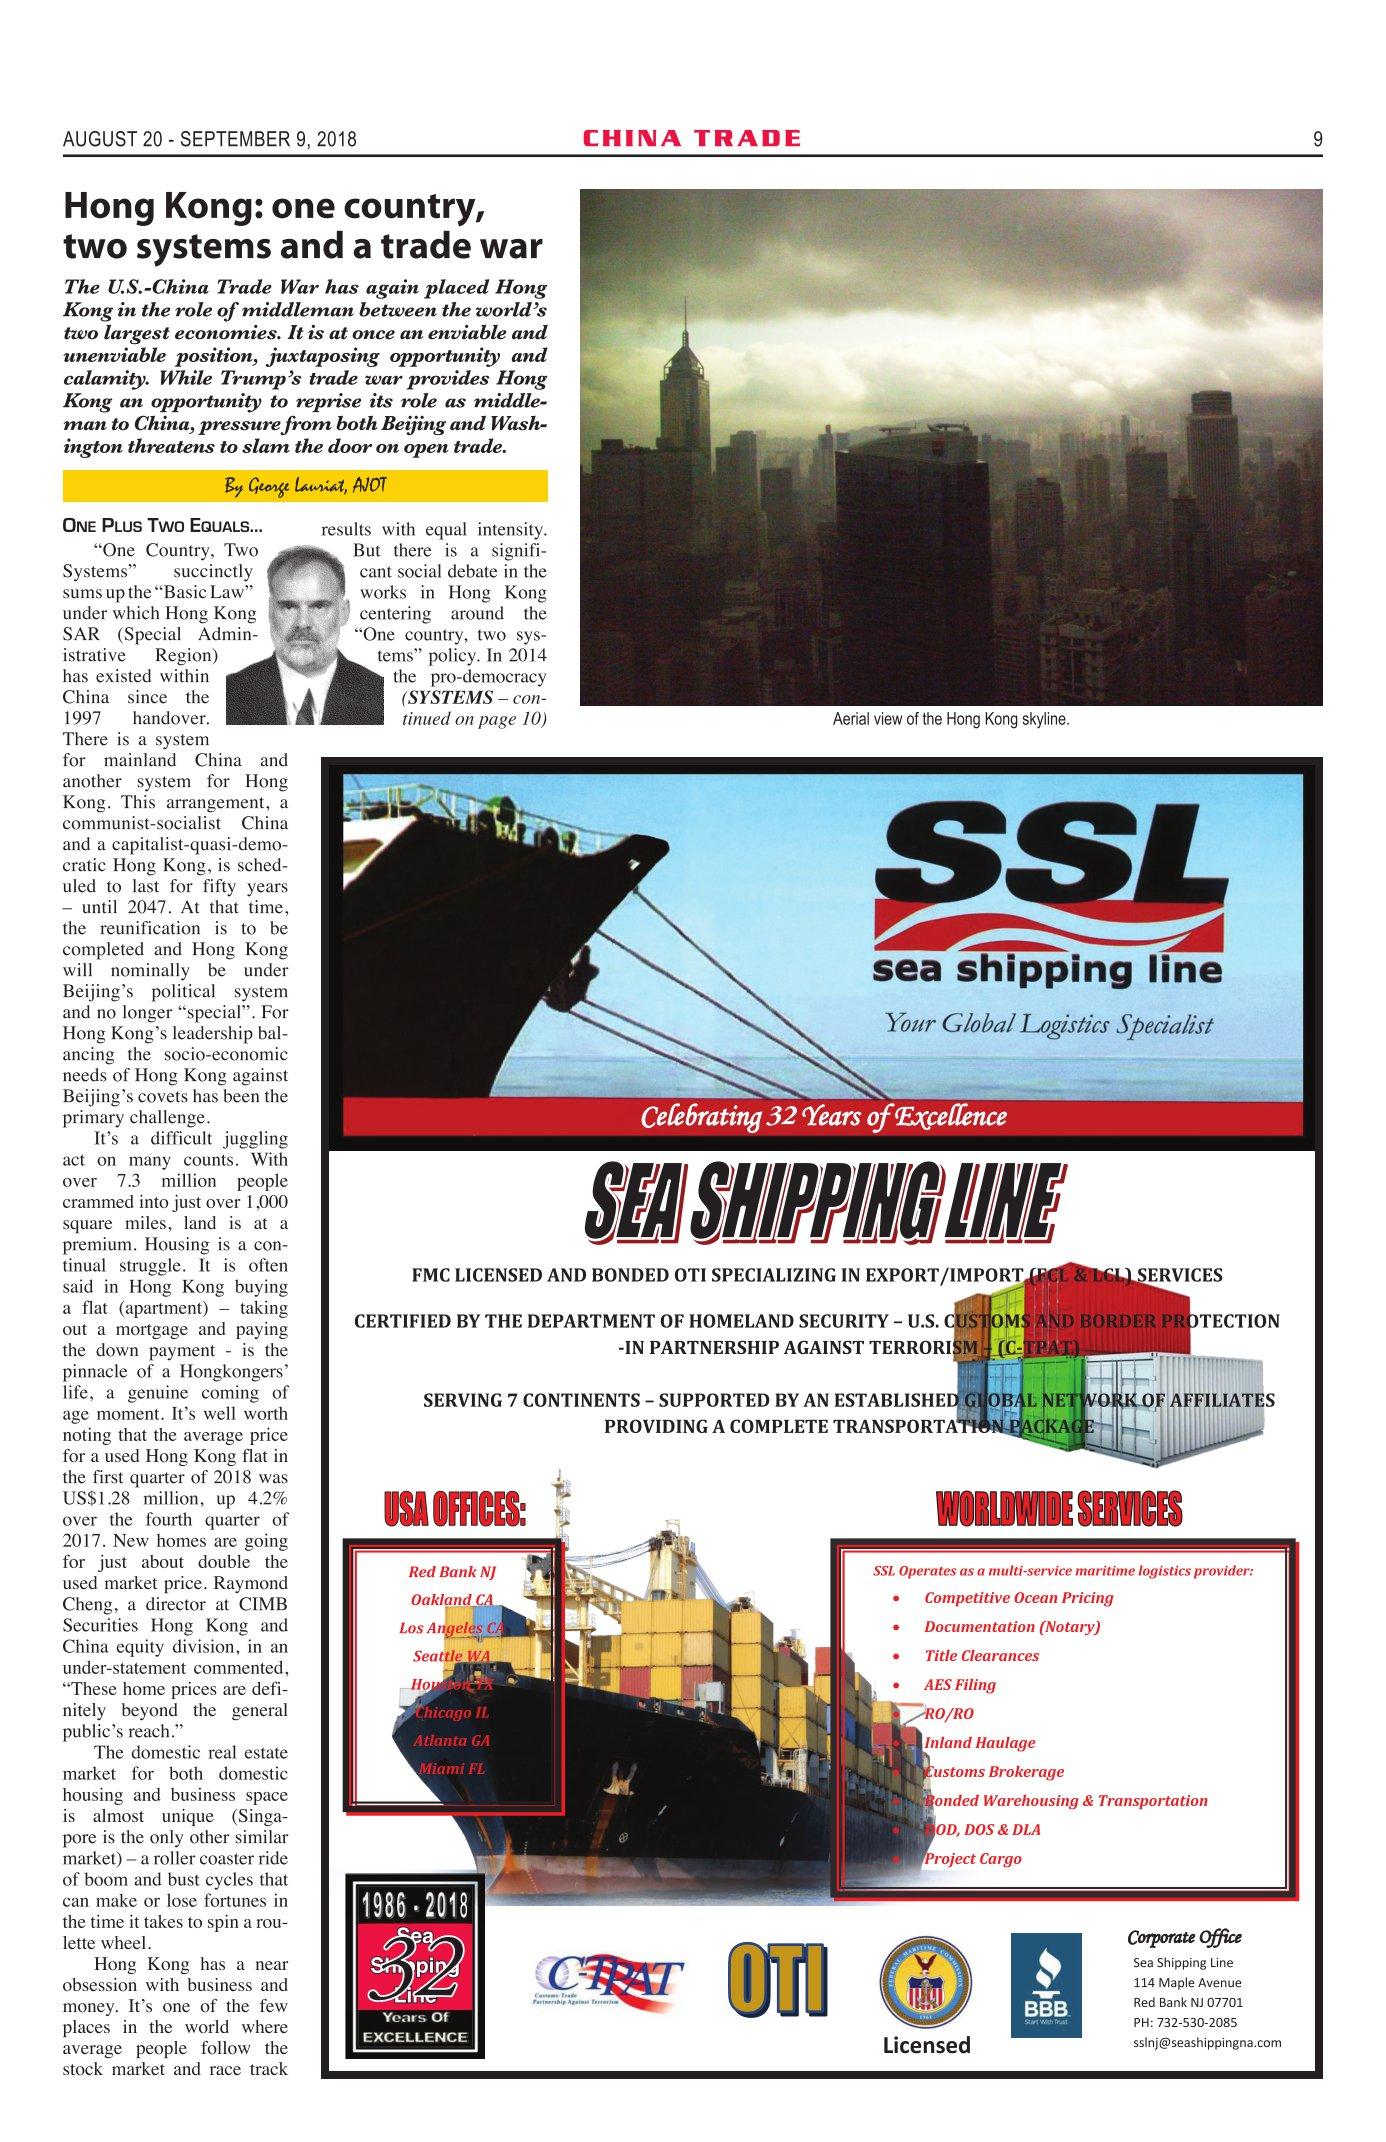 AJOT Digital Edition | Maryland Ports | China Trade | Issue #673